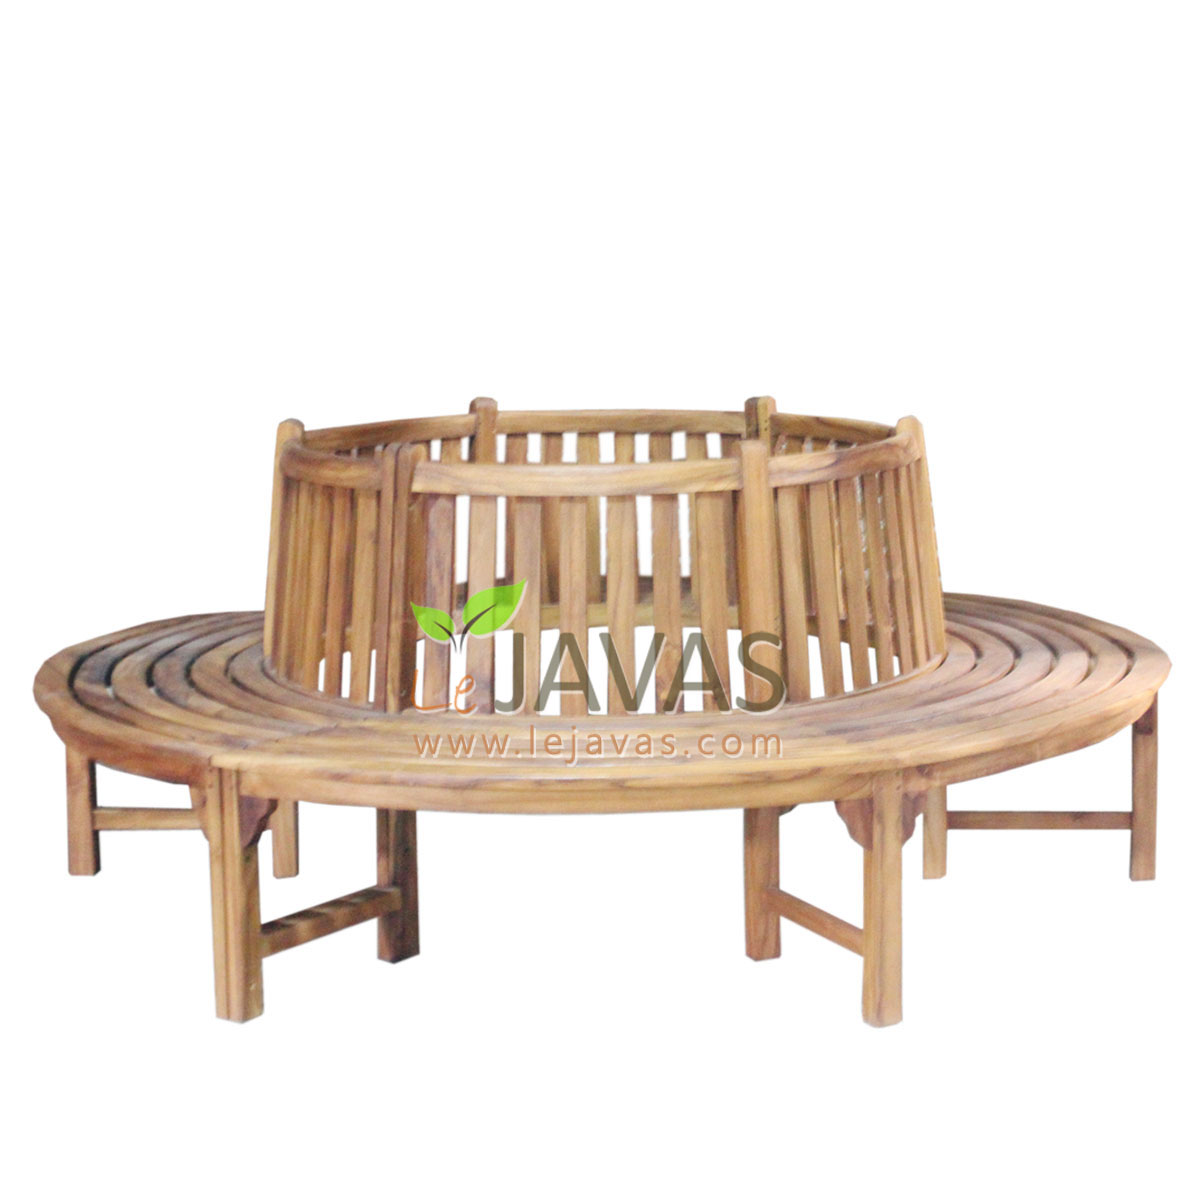 Teak Patio Round Tree Bench Le Javas Furniture Patio